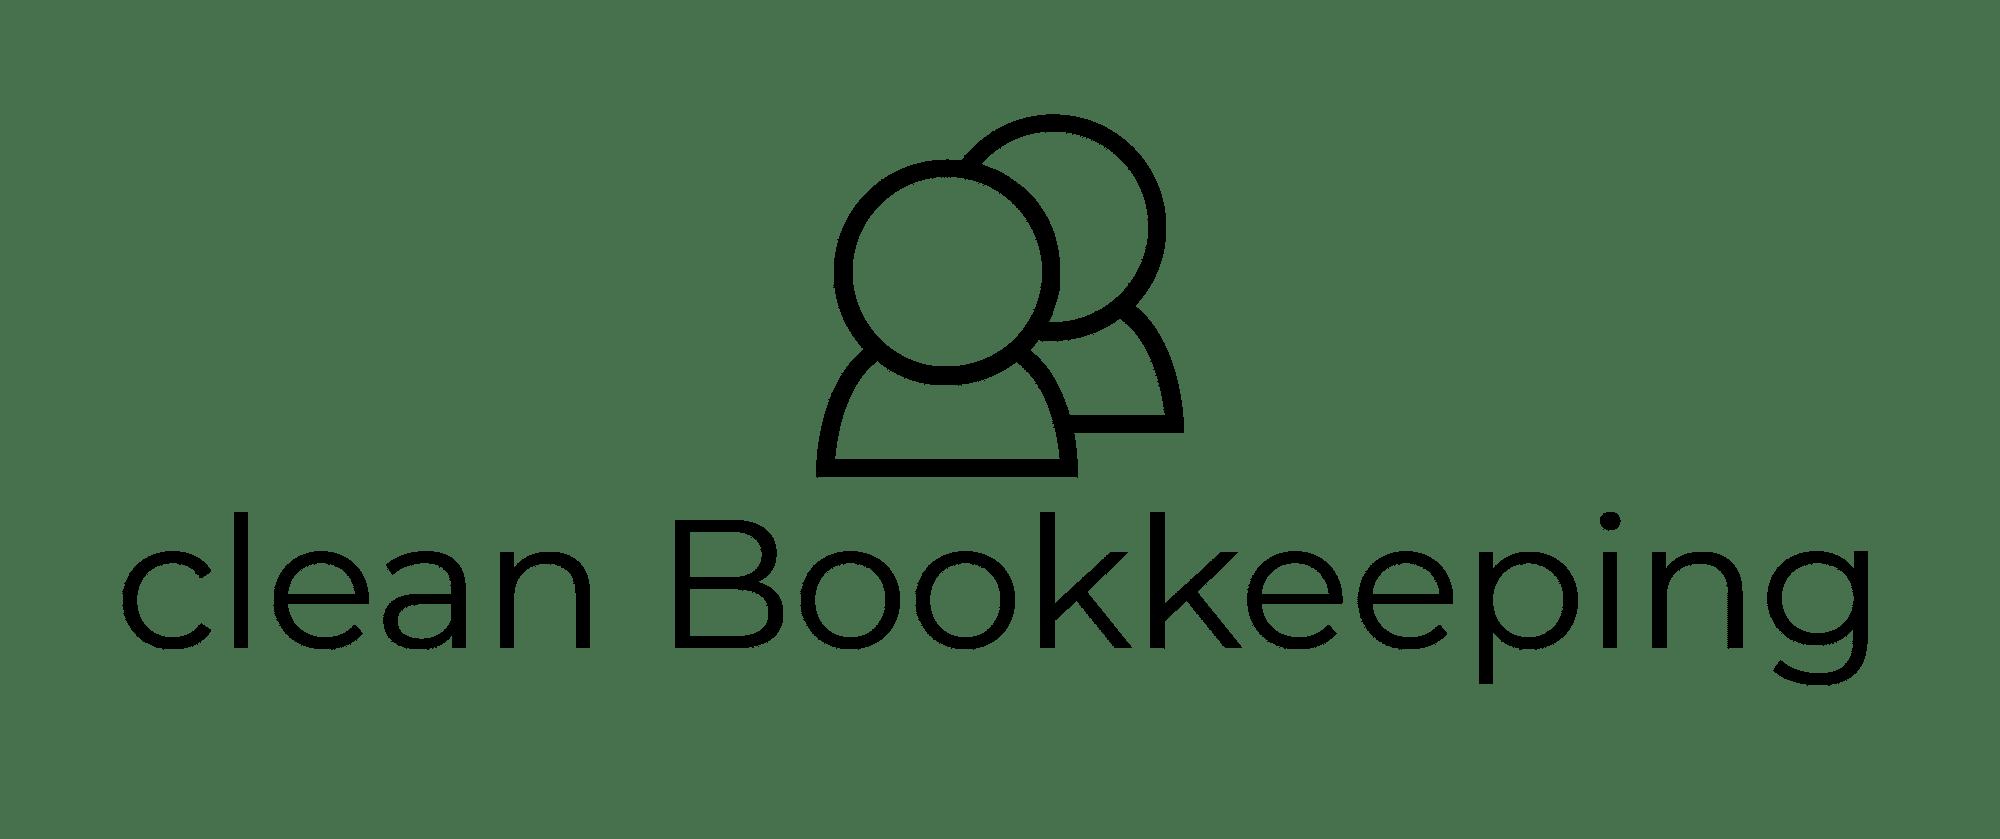 Clean Bookkeeping